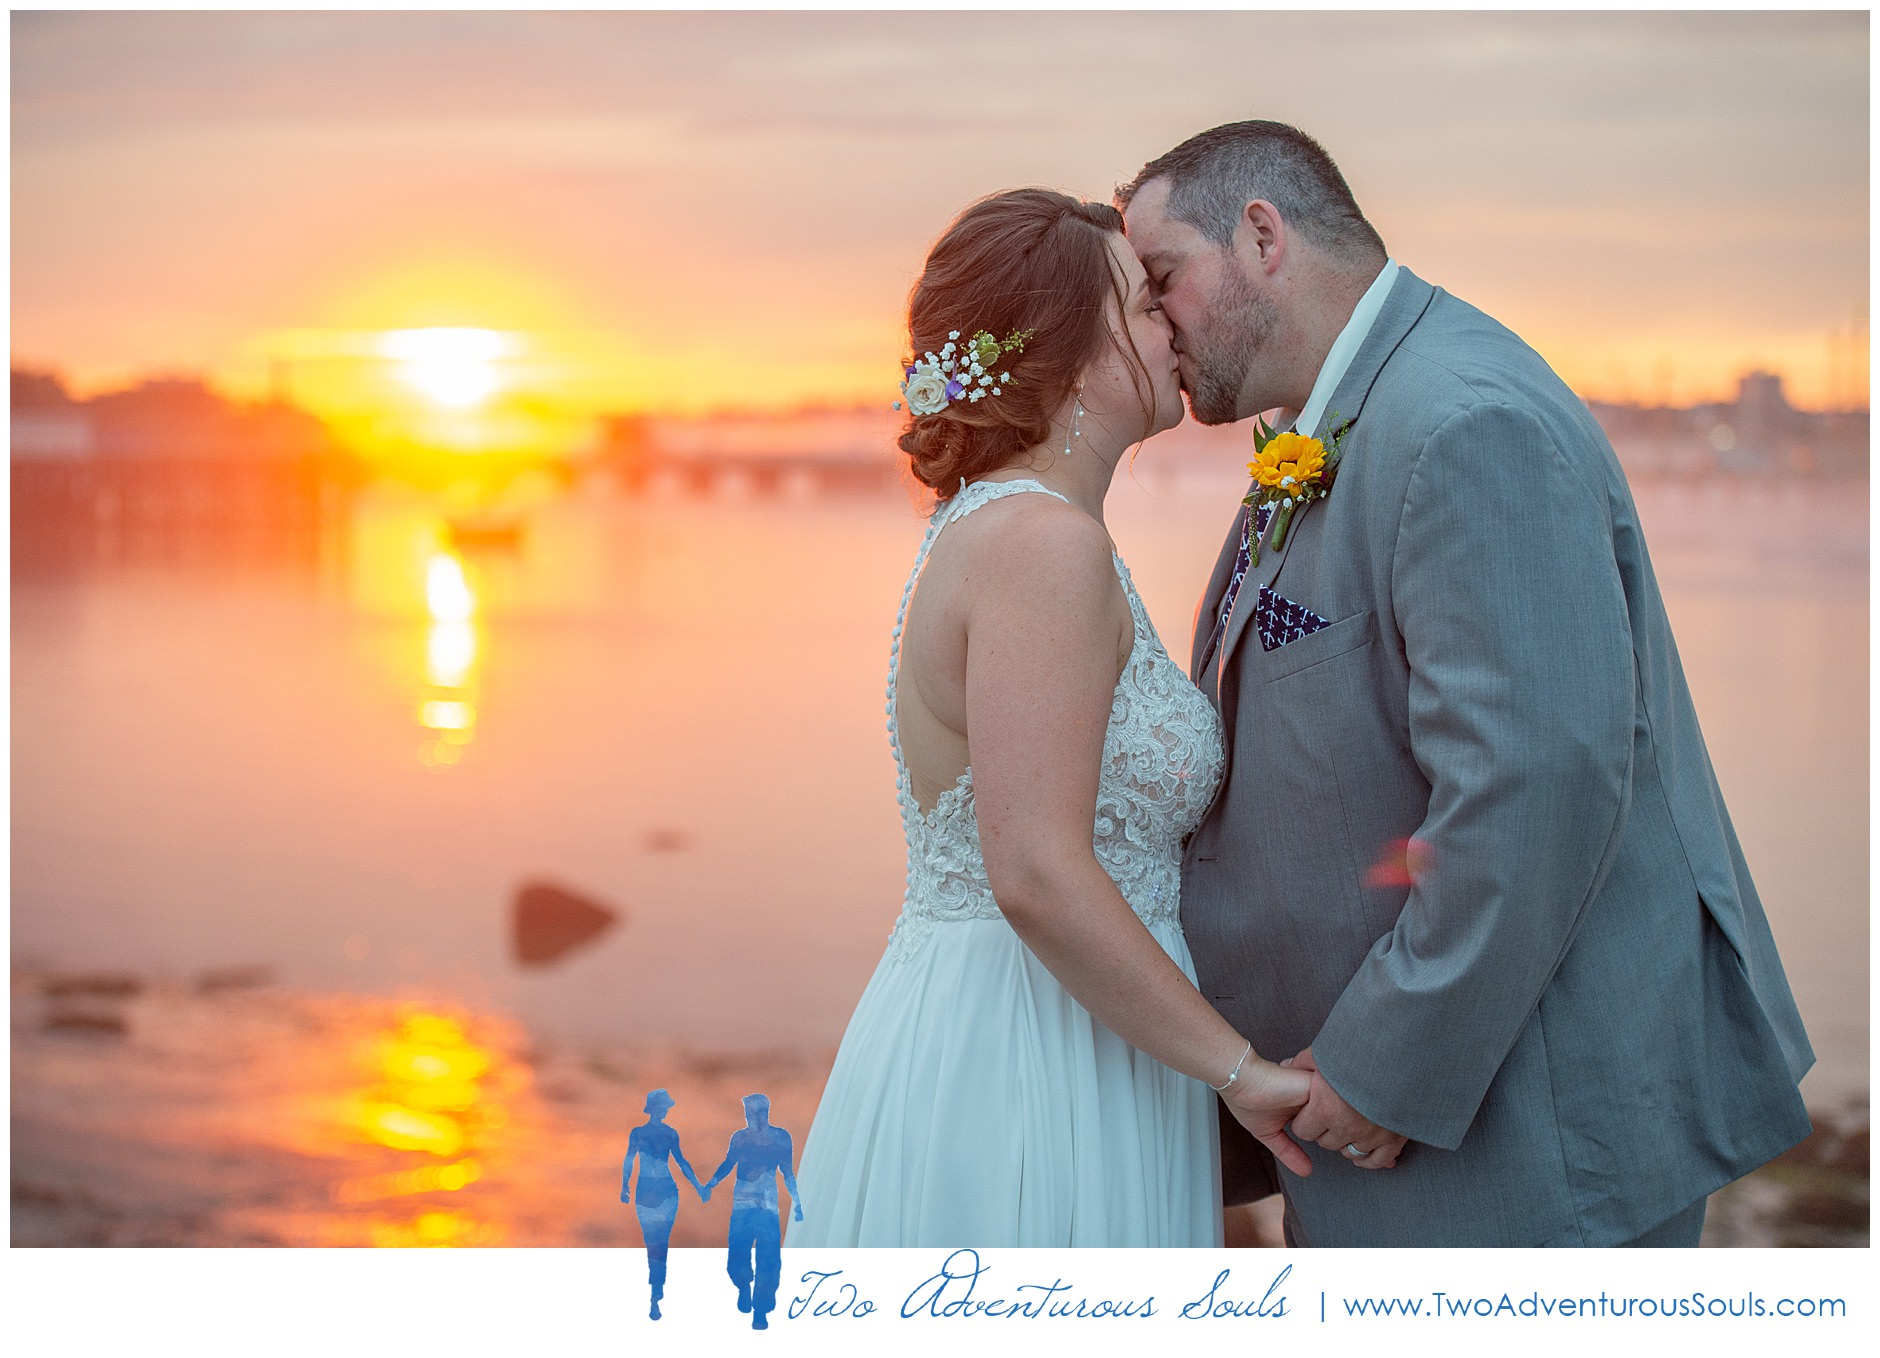 Maine Wedding Photographers, SMCC Wedding Photographers, Southern Maine Community College Wedding Photographers, Two Adventurous Souls-AshleyAaron_0040.jpg